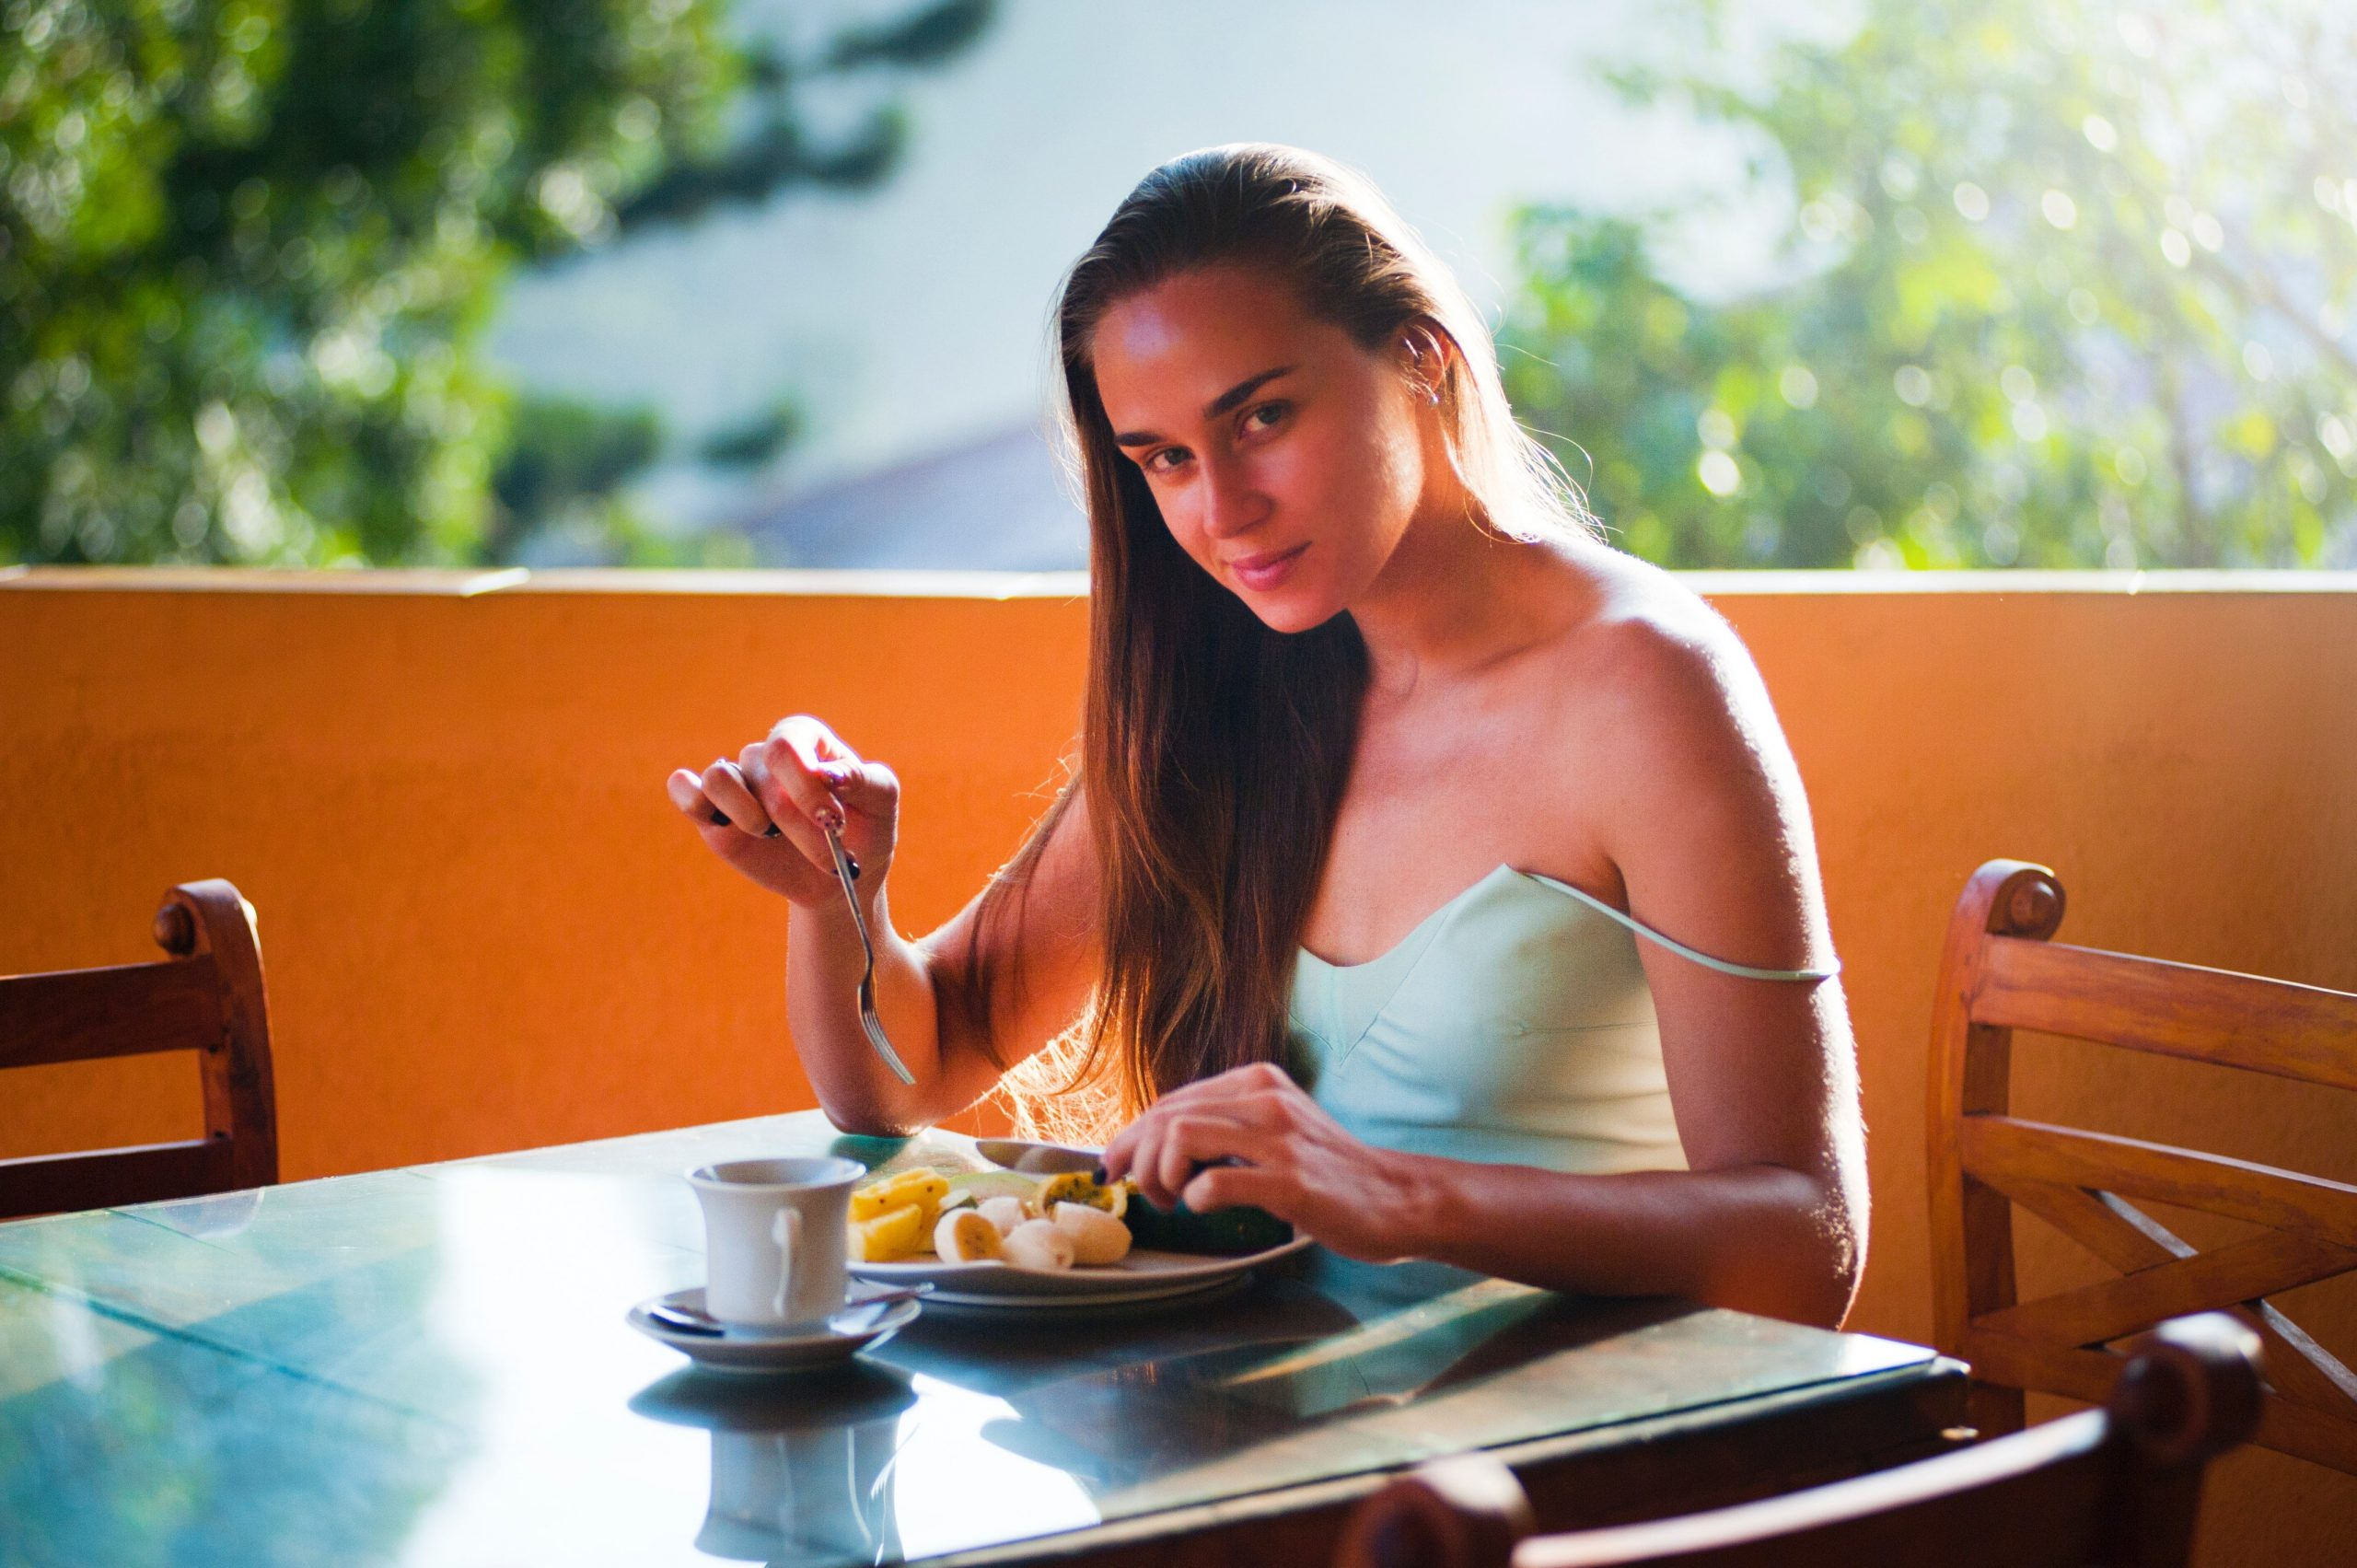 image of woman eating breakfast